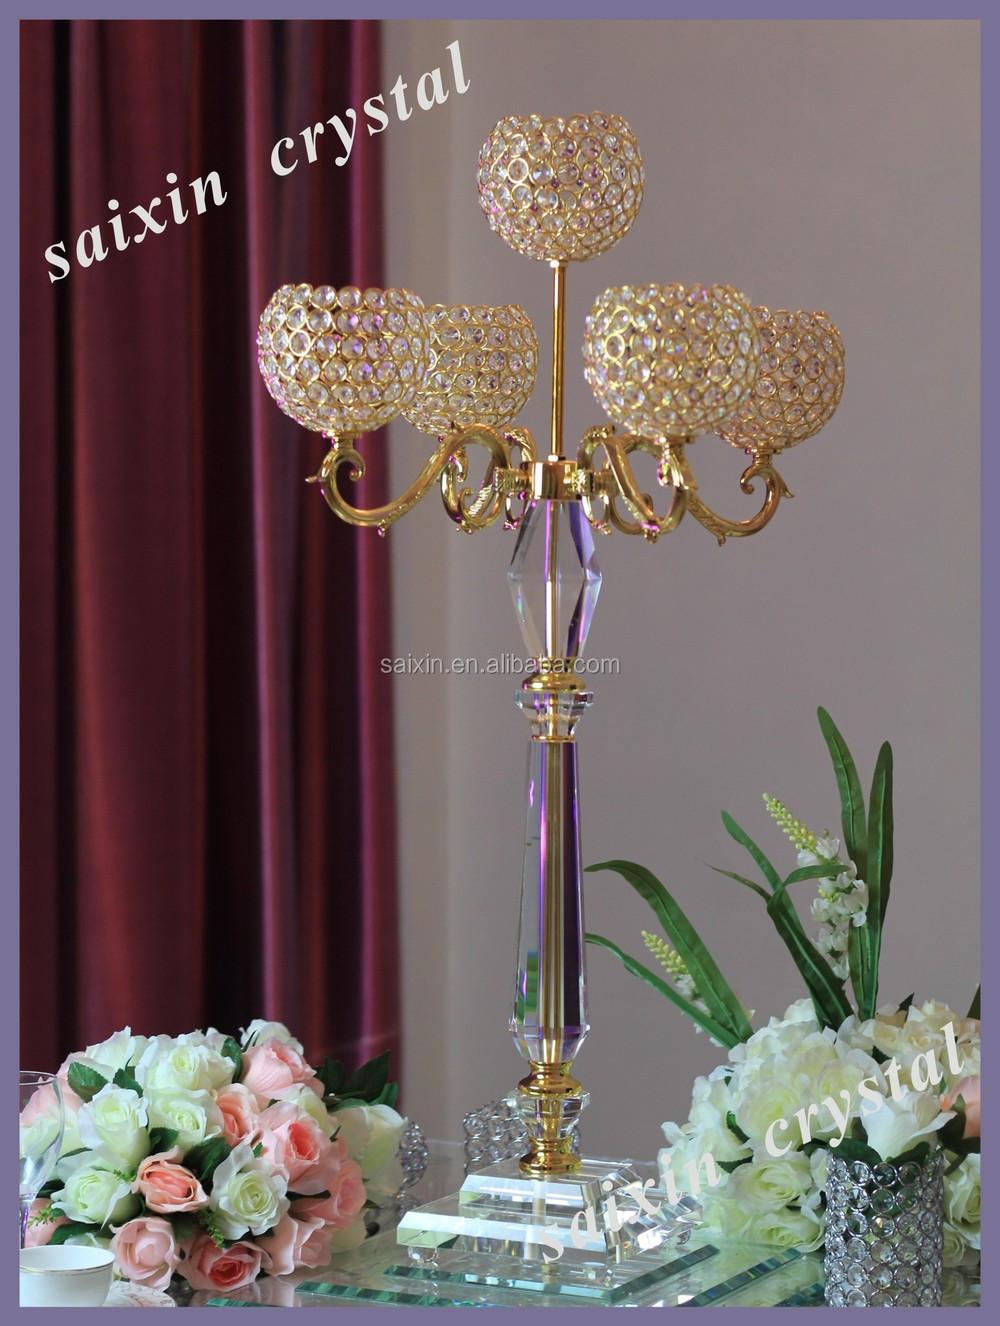 Gorgeous new design gold globe candelabra for wedding centerpieces gorgeous new design gold globe candelabra for wedding centerpieces junglespirit Images